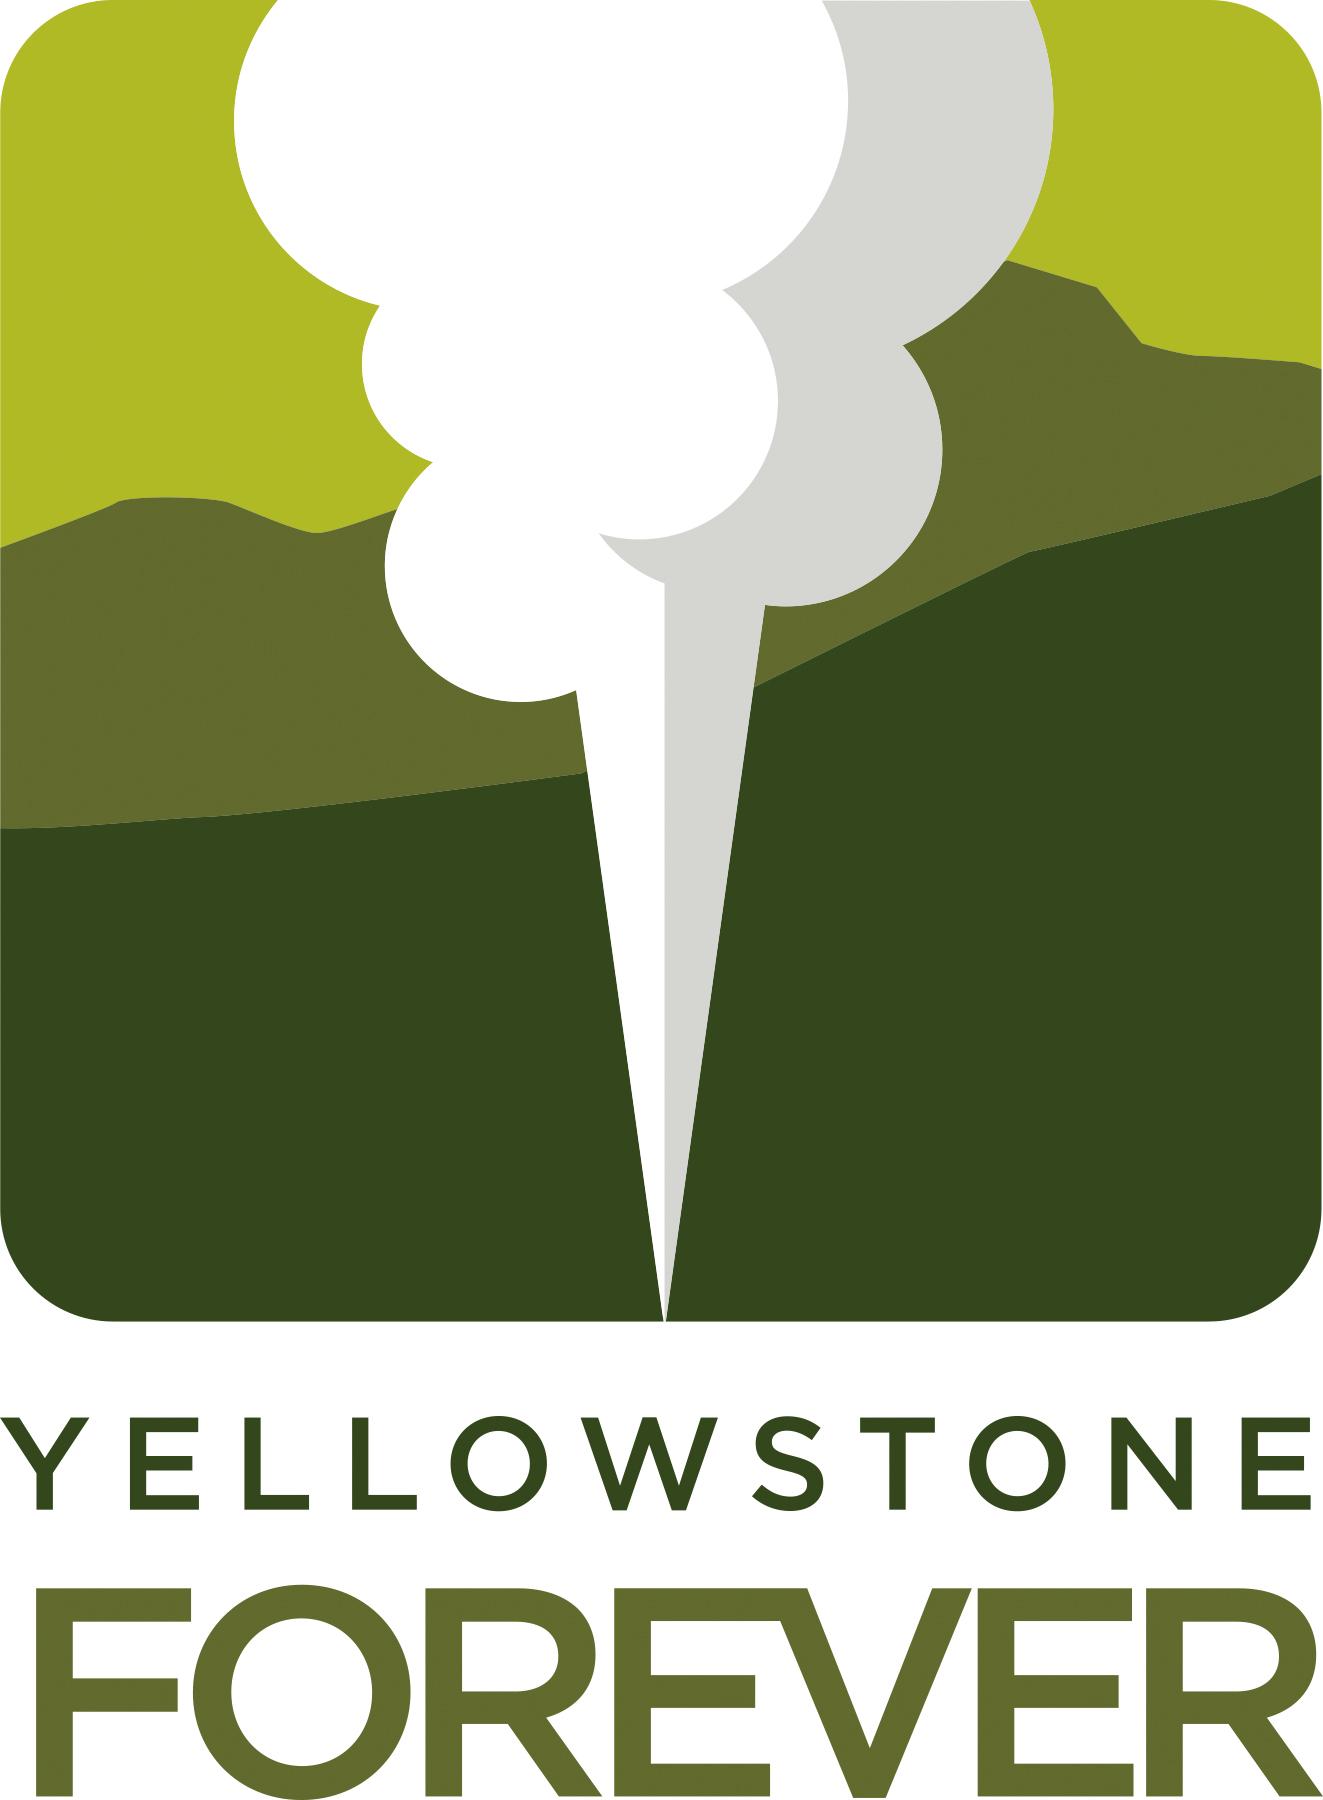 Yellowstone Forever Logo